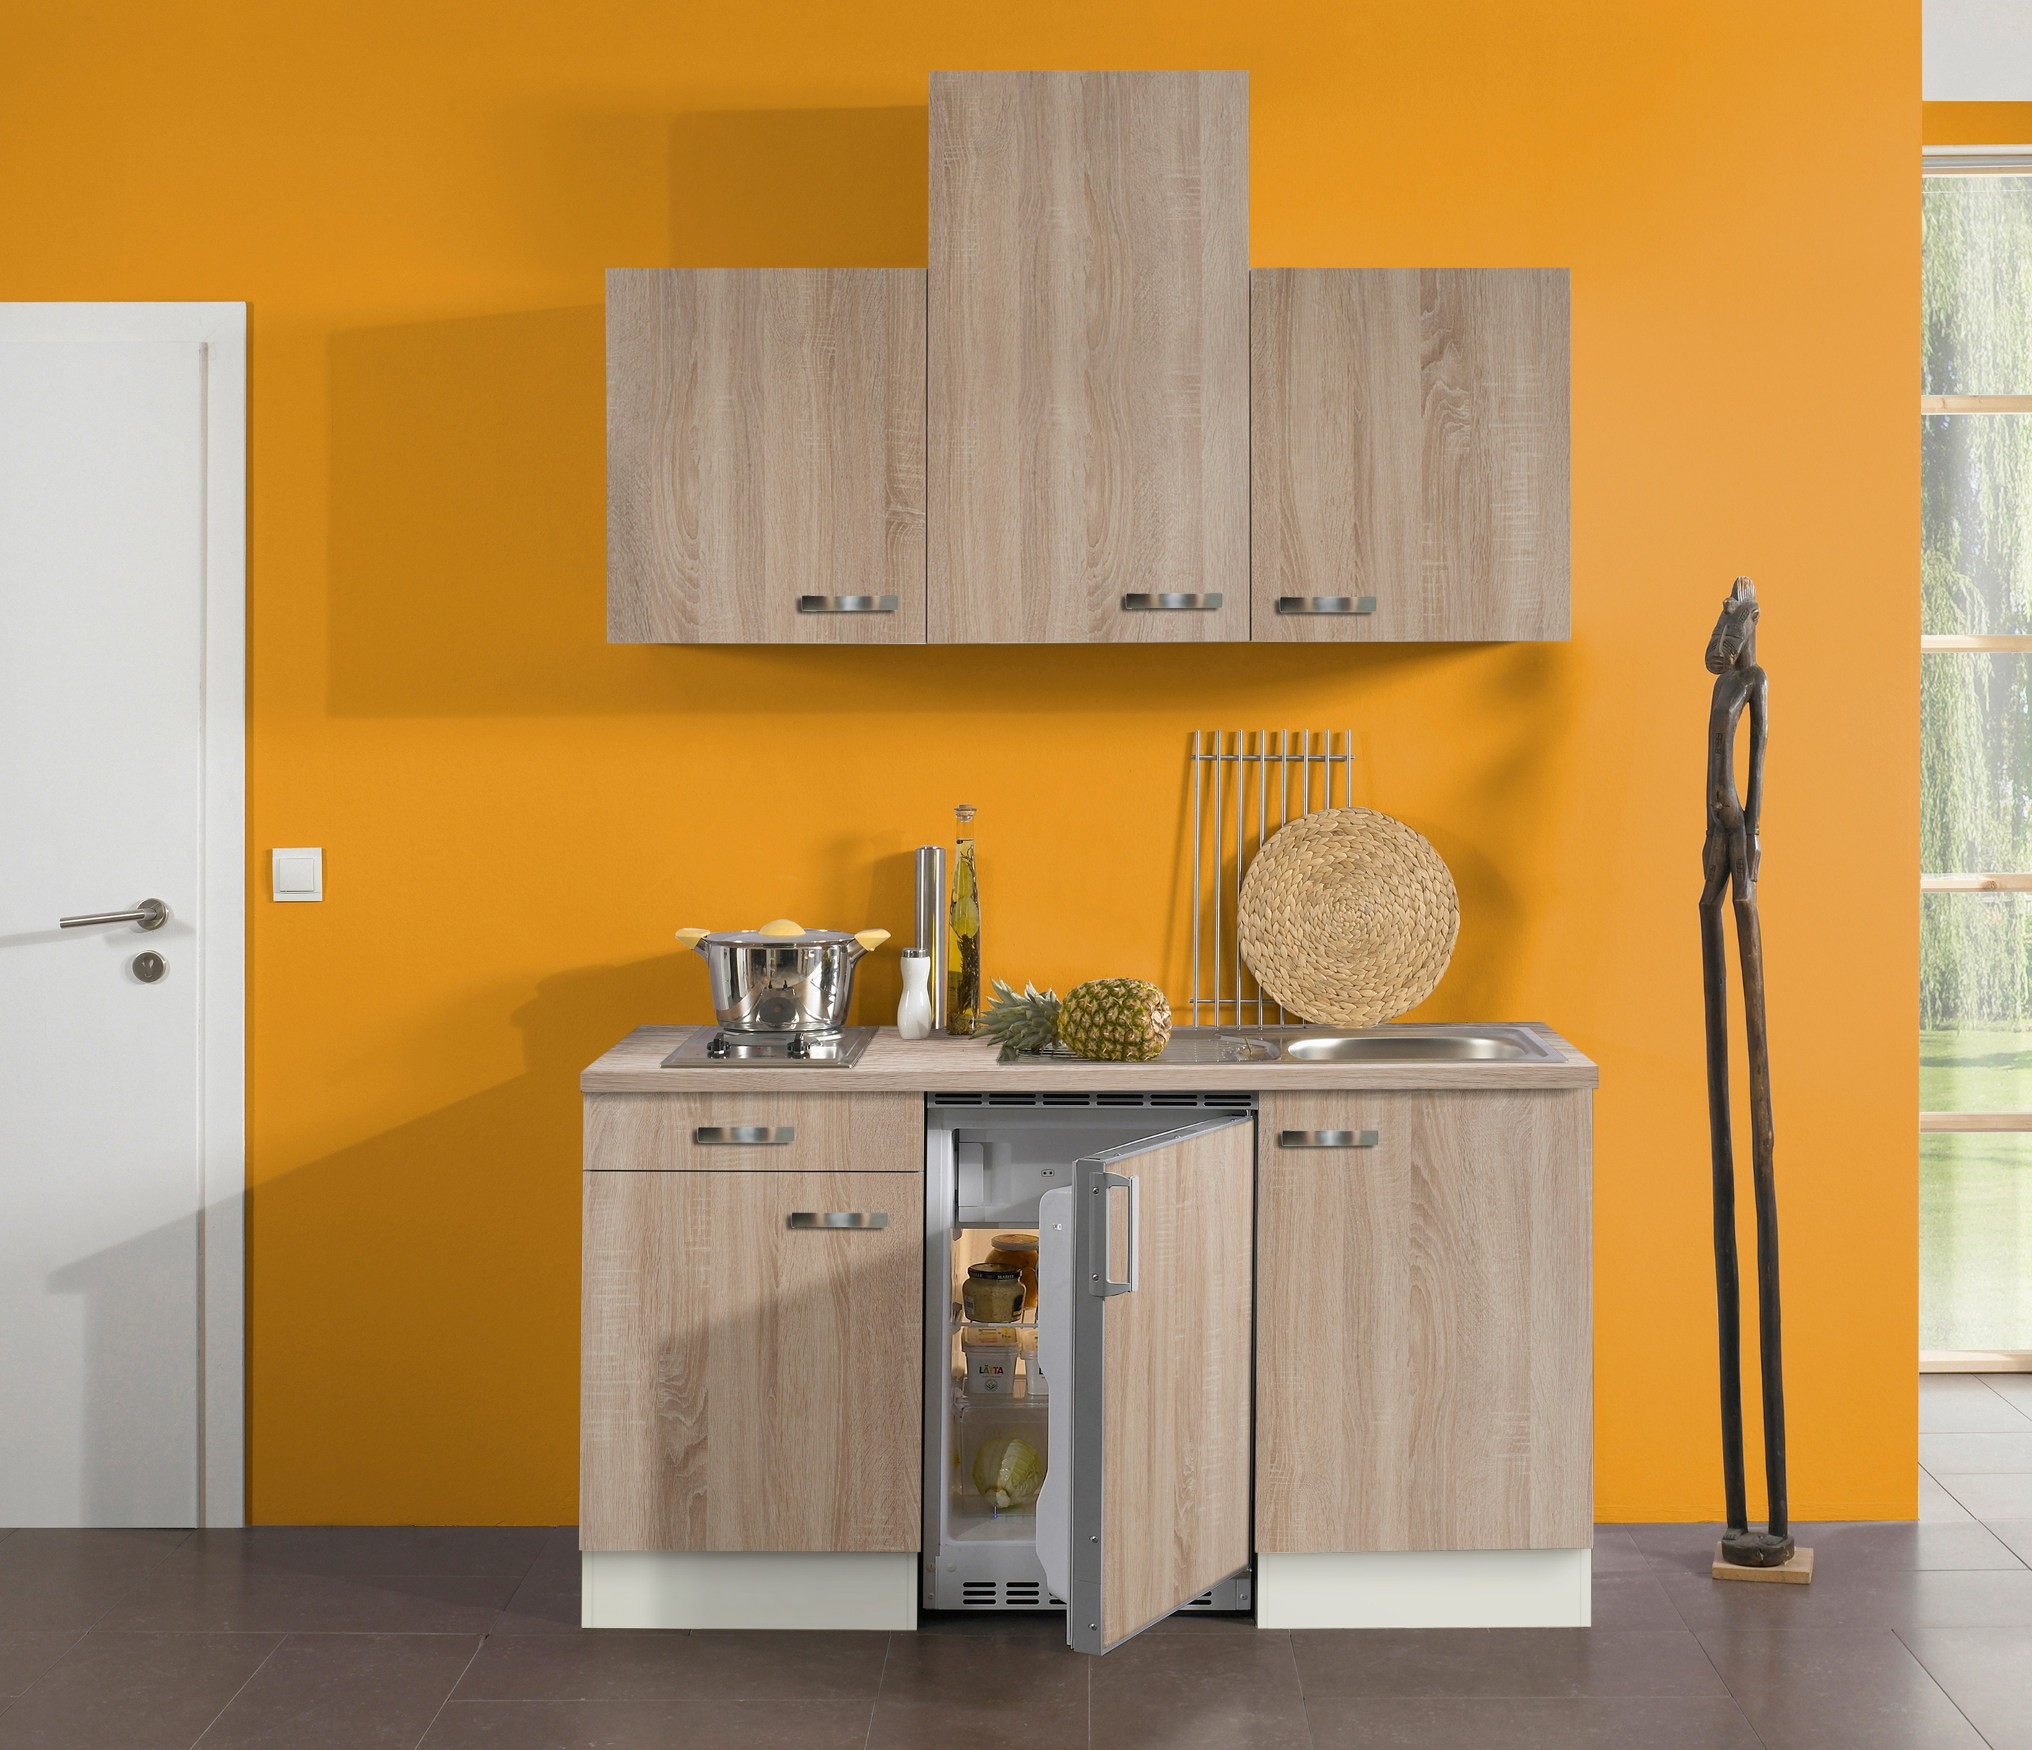 singlek che toledo vario 2 mit elektro kochfeld breite 150 cm eiche k che singlek chen. Black Bedroom Furniture Sets. Home Design Ideas